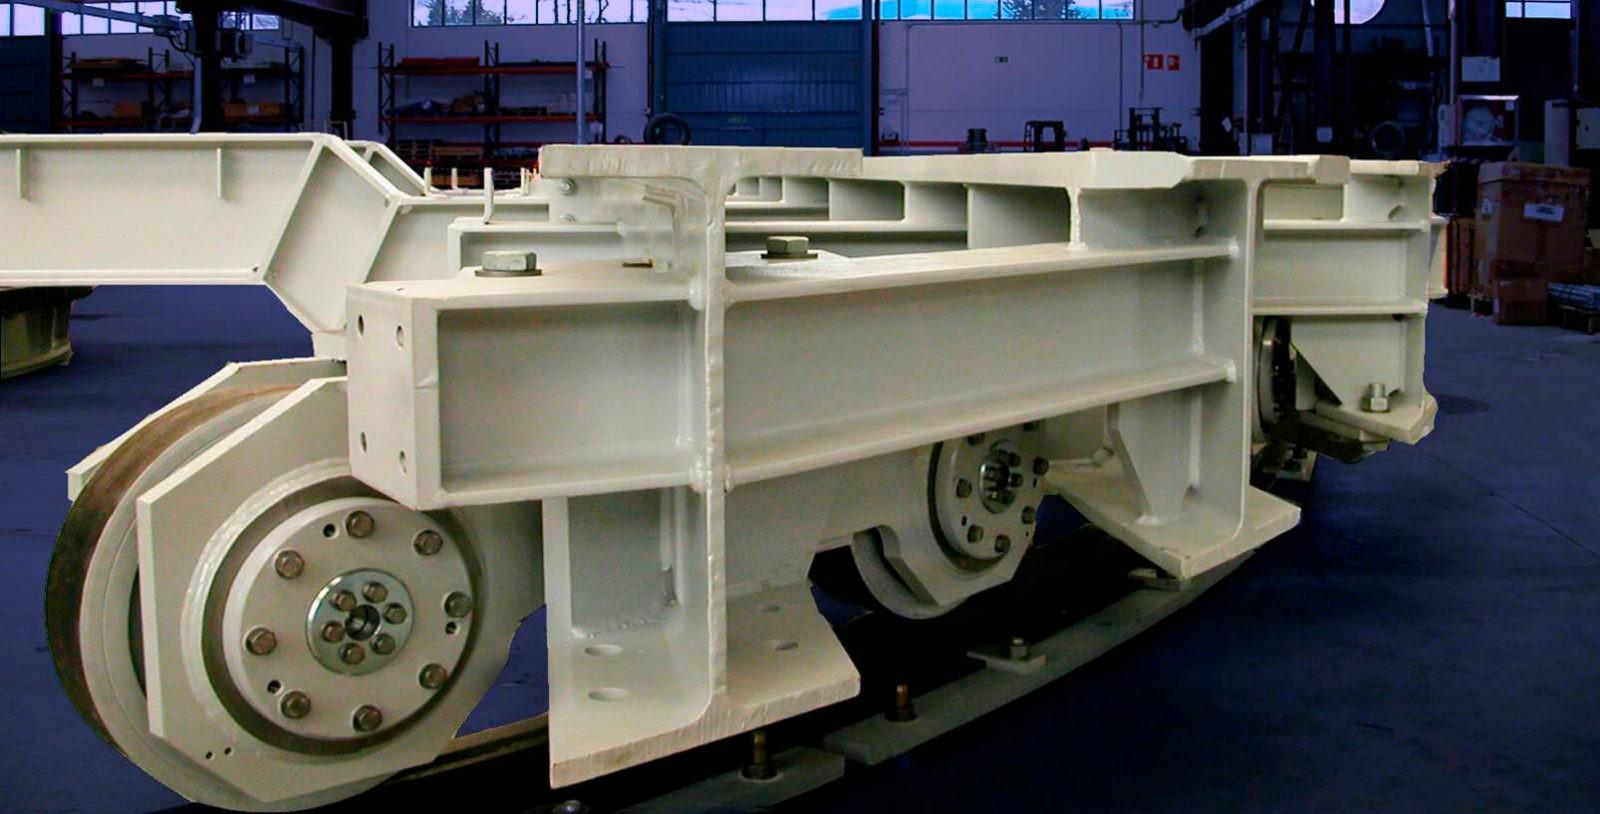 Locomotive_Turntables_Gatun_Locks_Panama_Canal_IDOM_4_